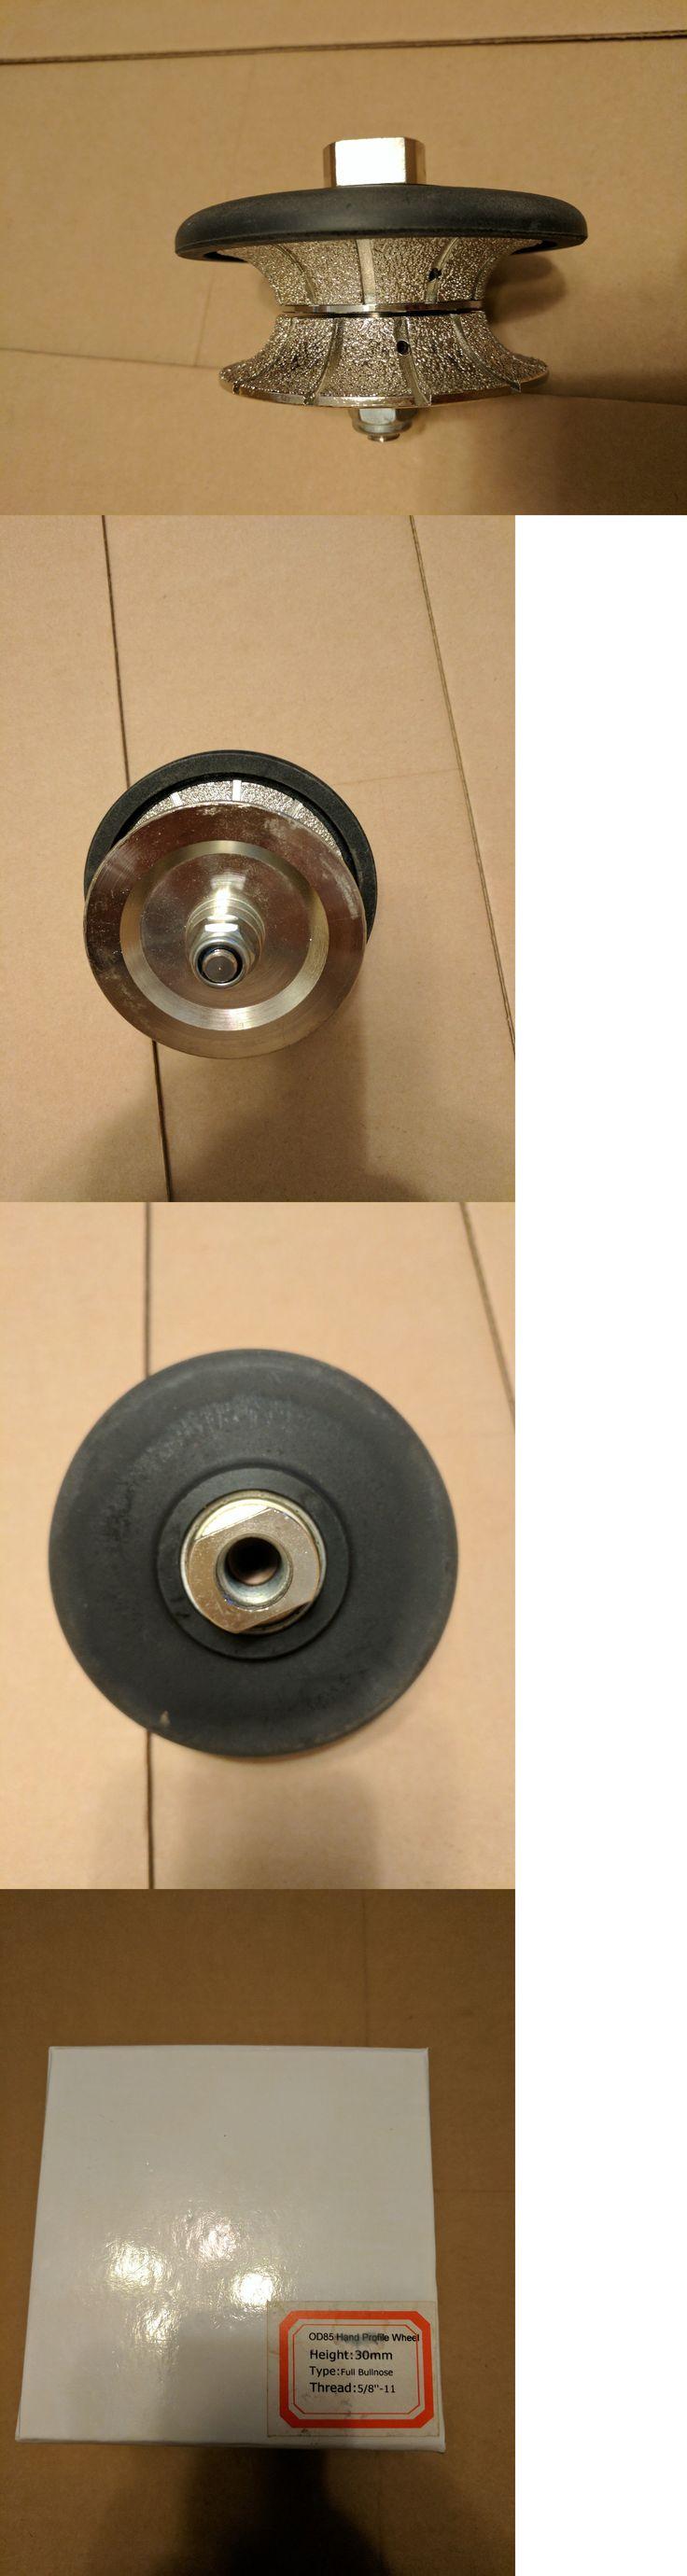 Gemini 59 inch modern single sink vanity set free shipping today - Router Bits 177001 Diamond Router Bit V30mm 1 1 4 Full Bullnose